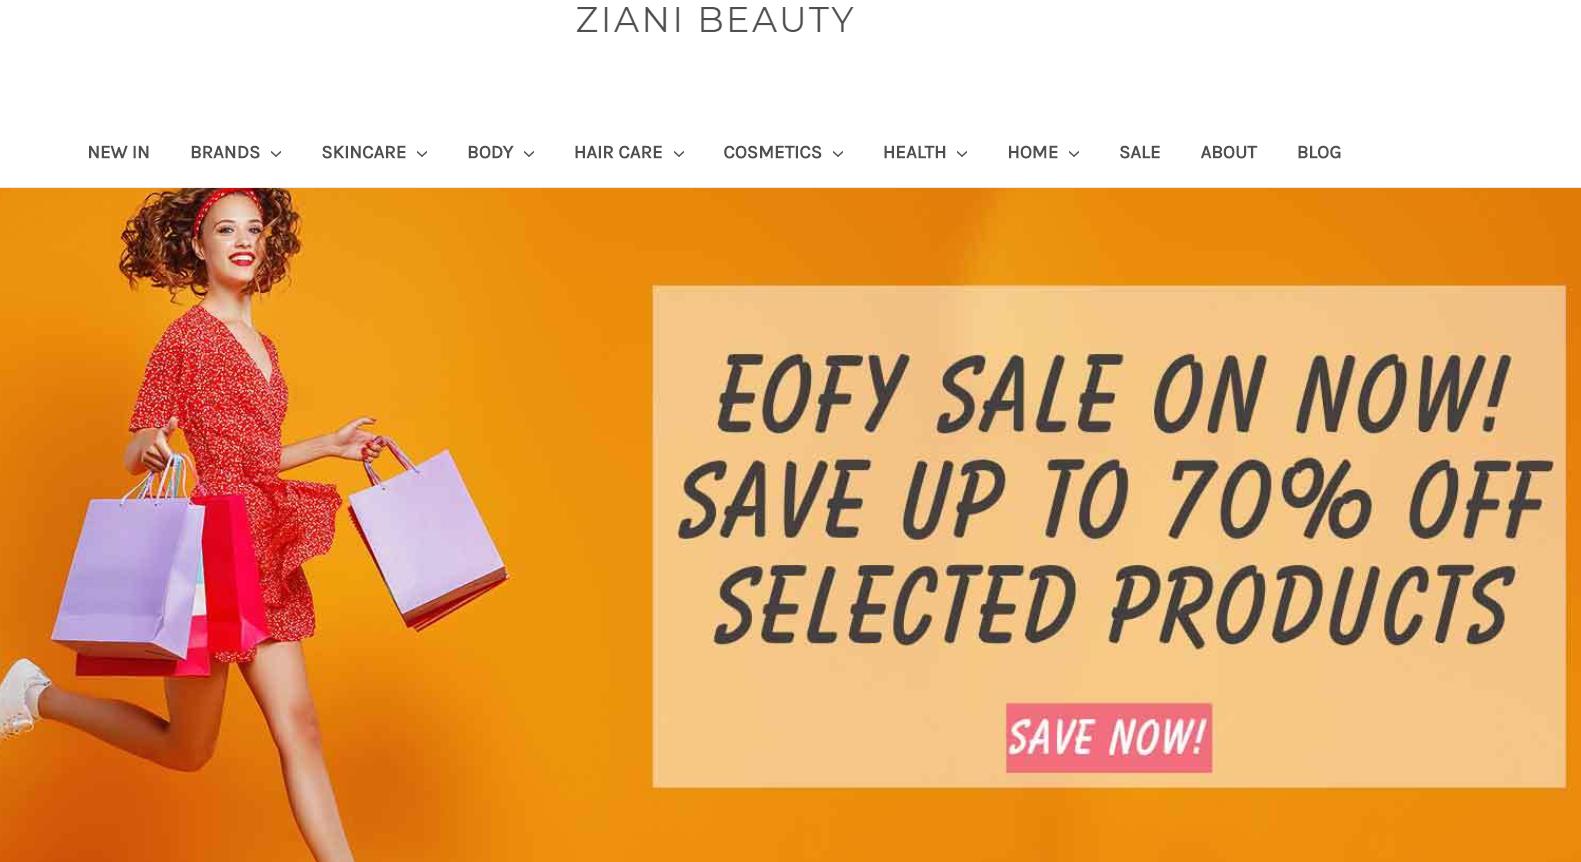 Ziani Beauty Promo codes at HotOz